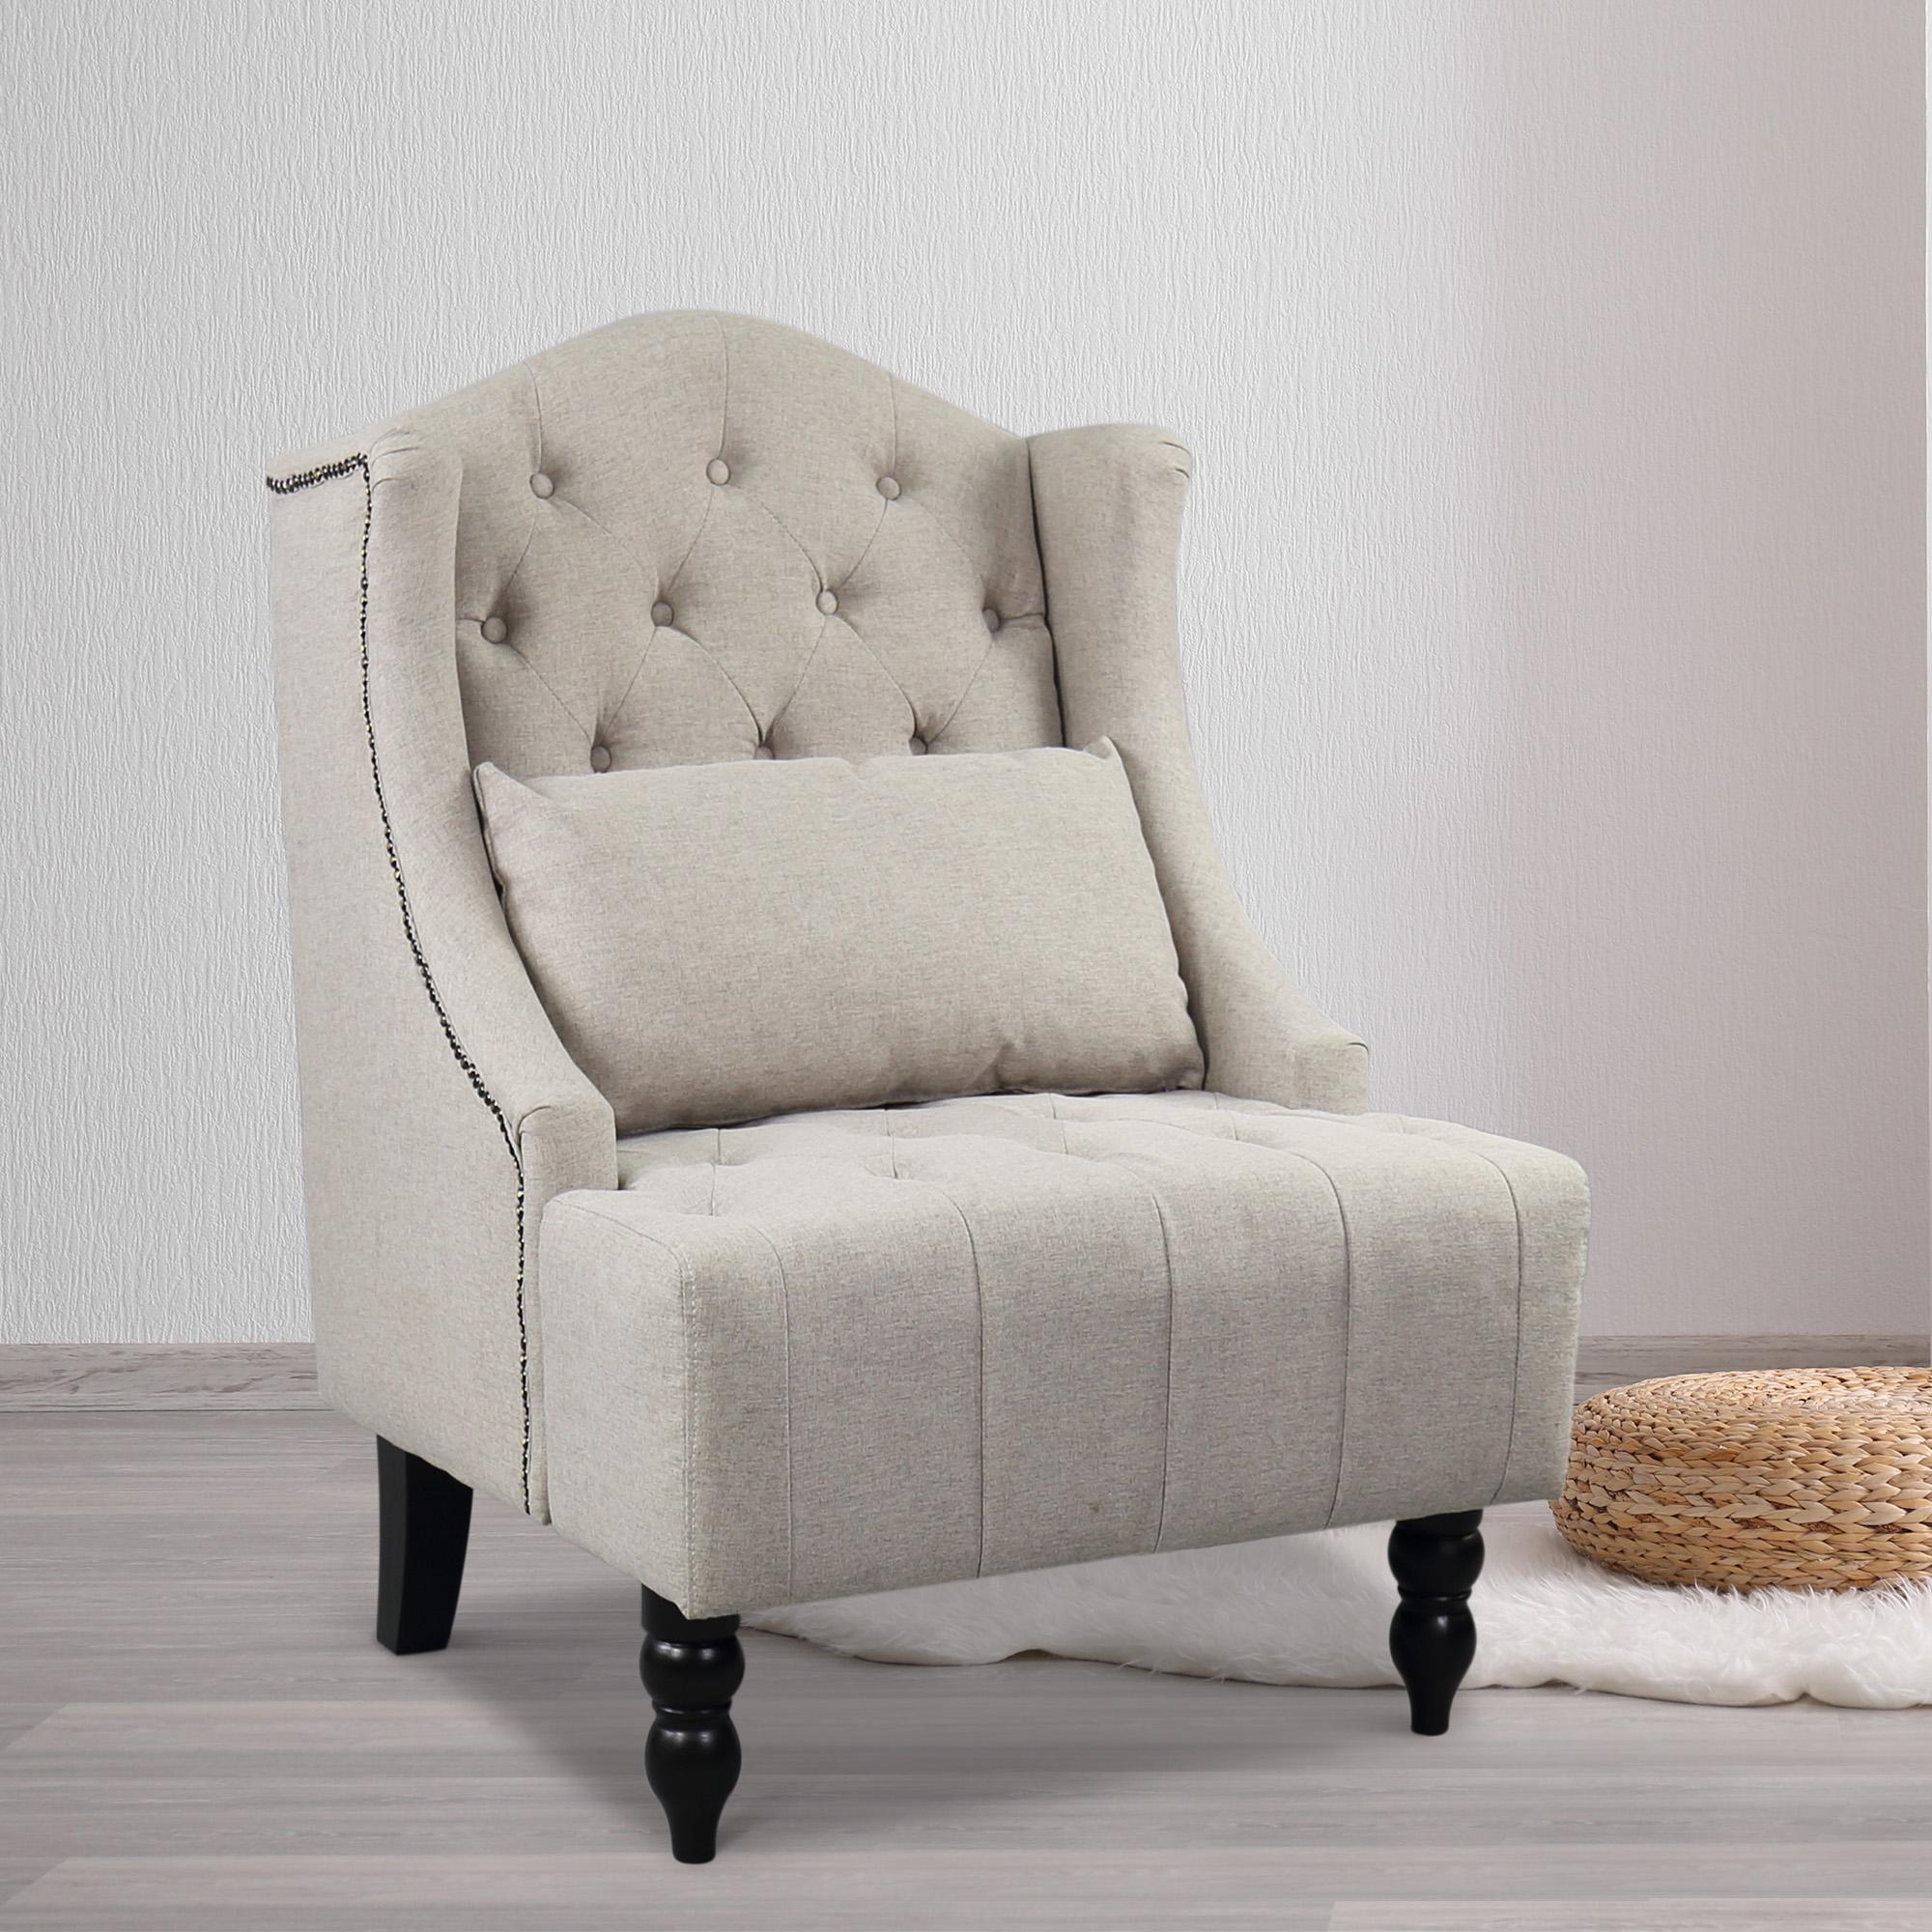 Tall Wingback Tufted Chair Accent Club Chair Nailhead Living Room